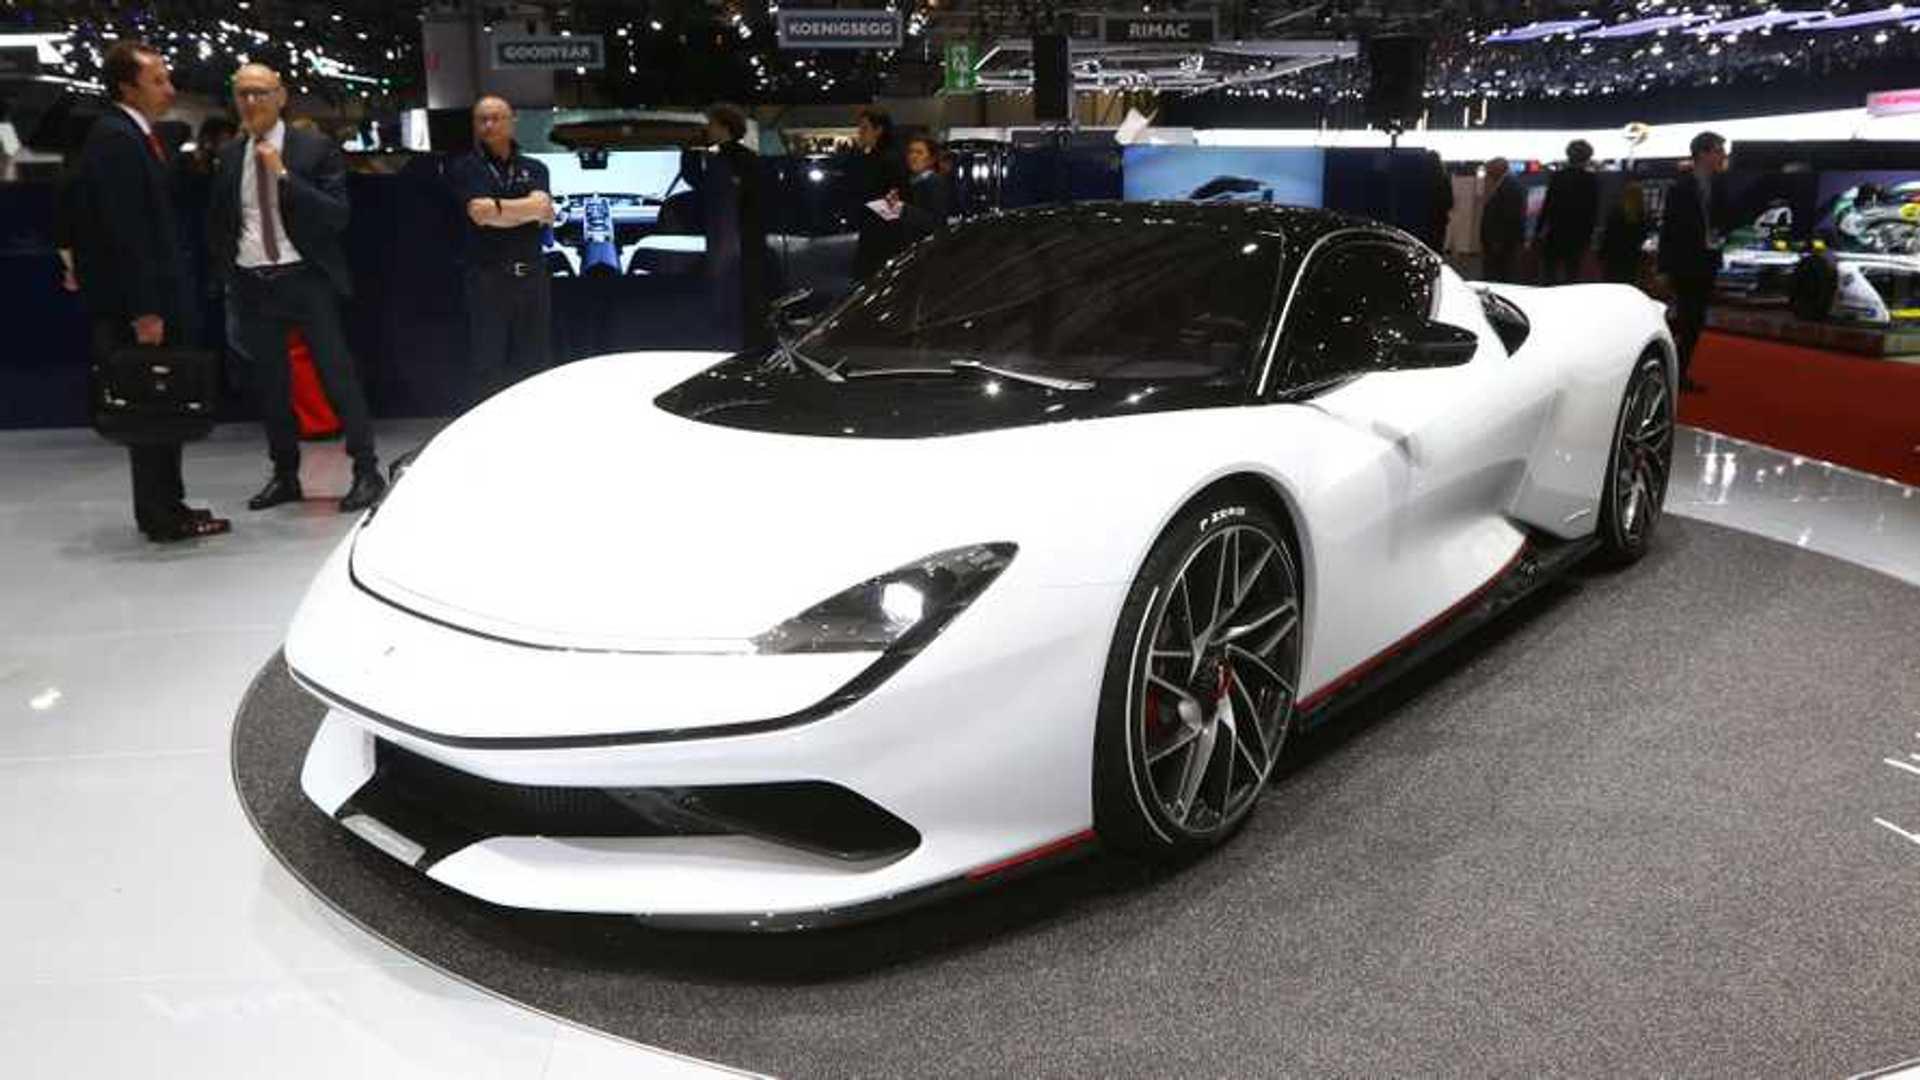 Pininfarina Battista revealed in Geneva: Most powerful Italian road car ever